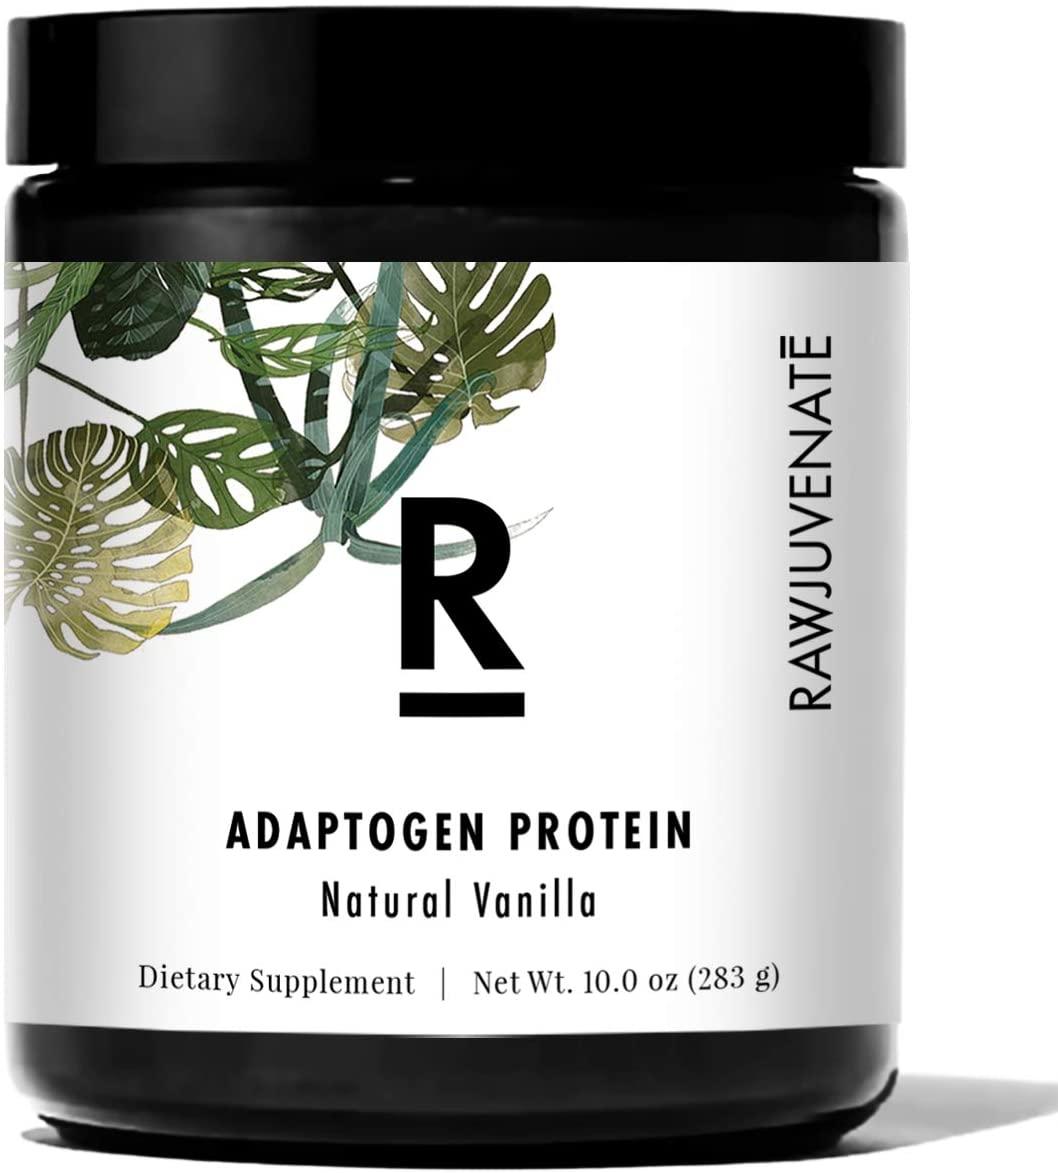 RAWJUVENATE Adaptogen Protein for Stress Relief, Vanilla, 10 oz